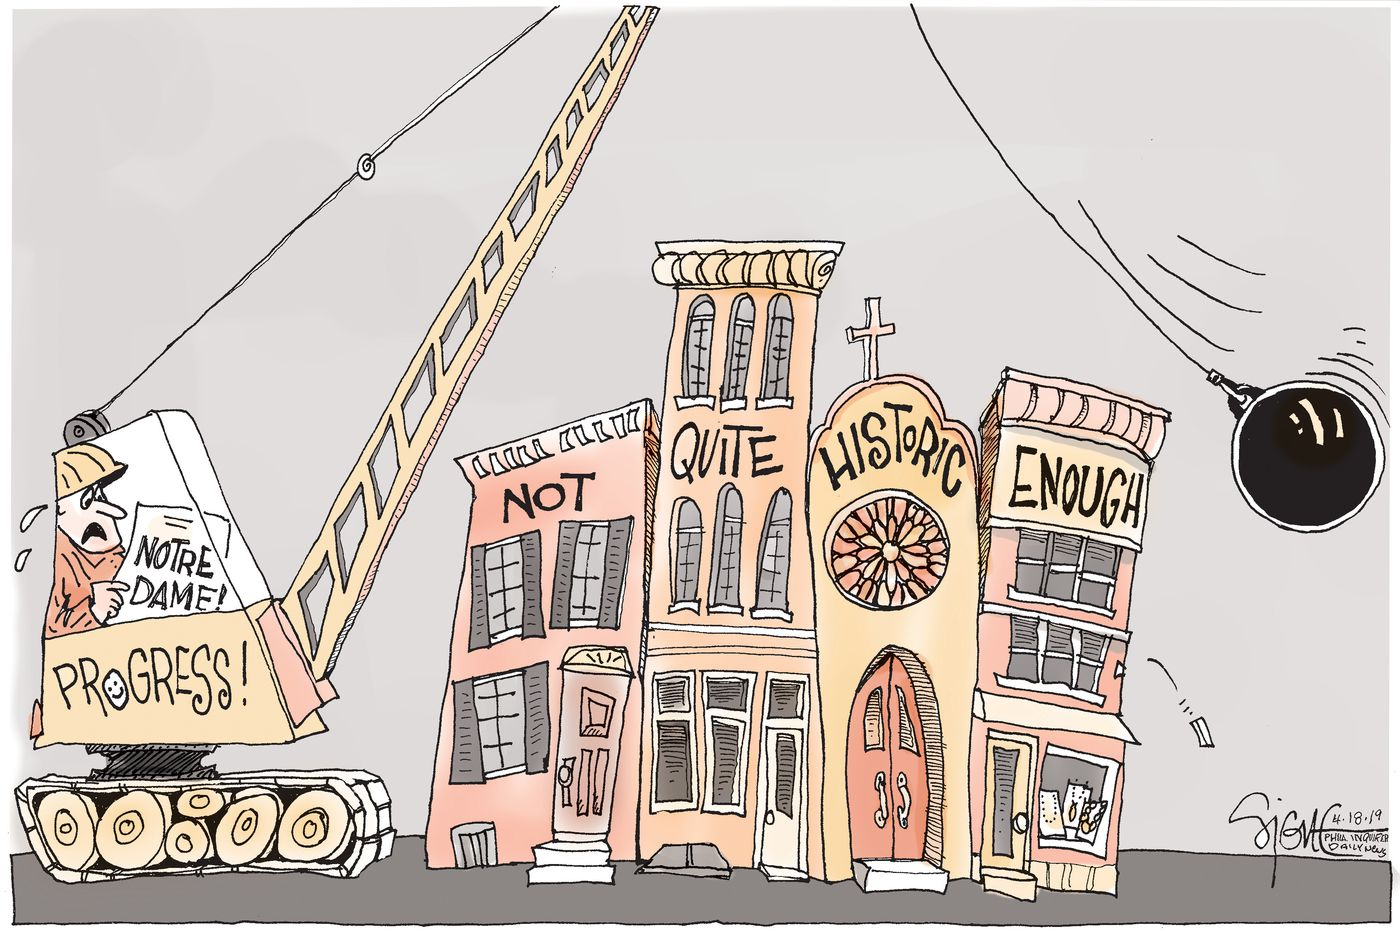 Political Cartoon: Preserving not-quite-Notre Dame buildings